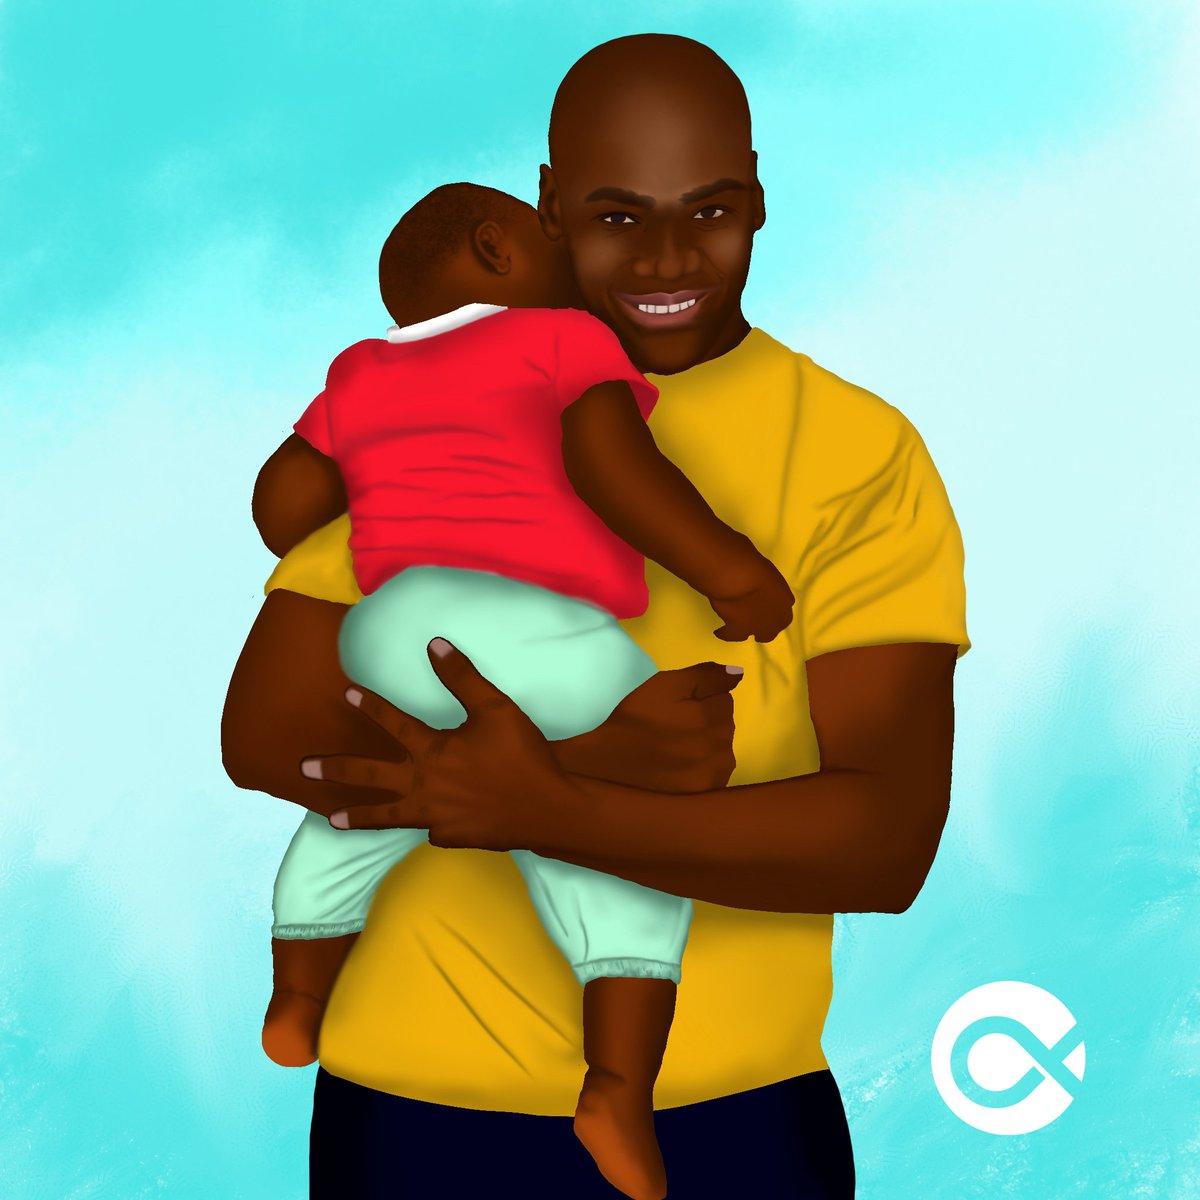 Late...but we couldn't miss this day... Happy Father's day with Artifex  #happyfathersday #art  #artwork #haiti #haitian #haitianfood #haitianhero #haitianheritagemonth #lakayselakay #vibekreyol #kreyolhaiti #kreyolessence #kiltilakay #caribbean https://t.co/HGD92SiC4f